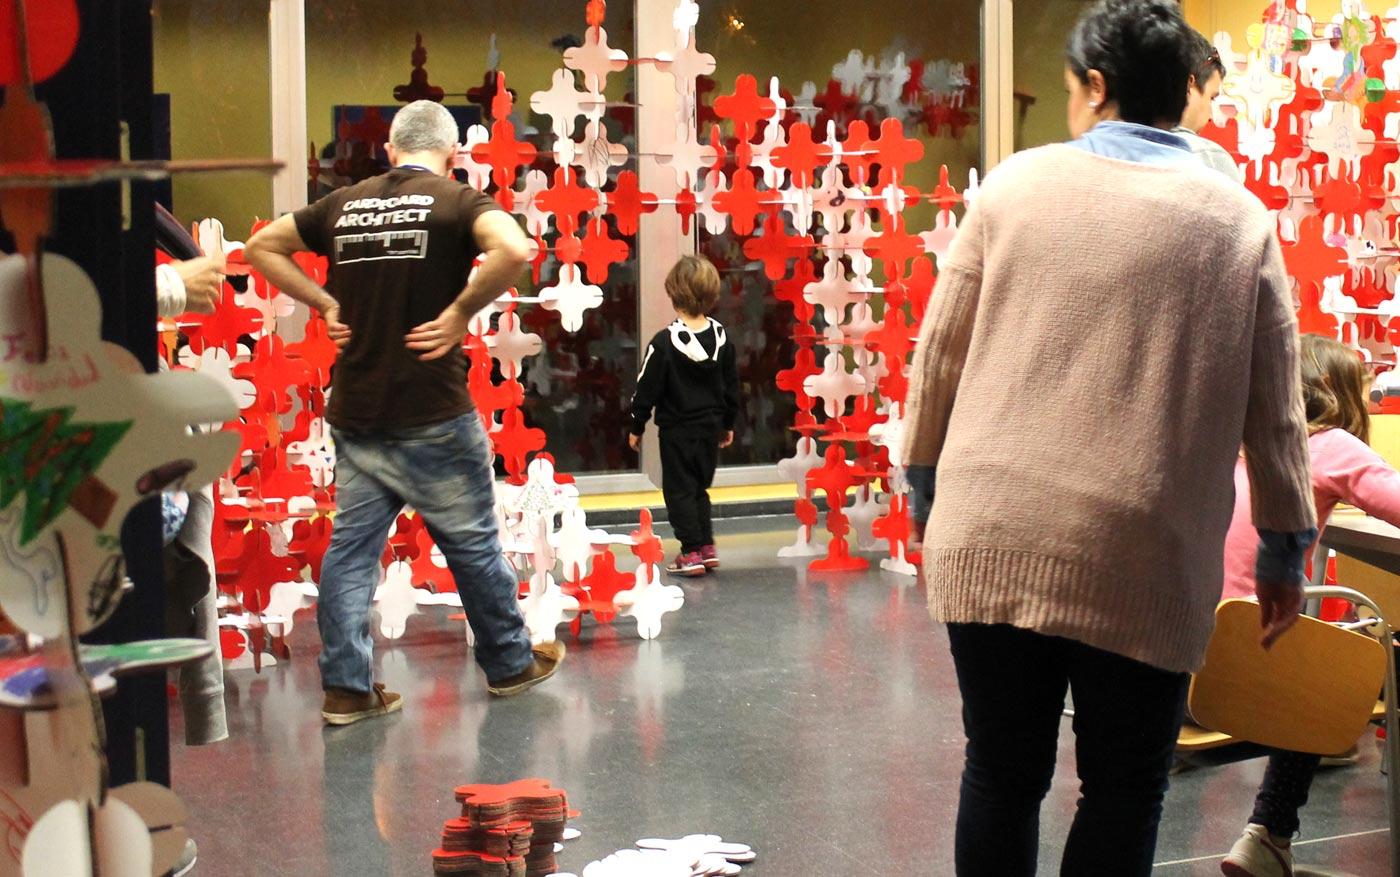 talleres infantiles navideños pozuelo de alarcon estructuras magicas en carton cartonlab